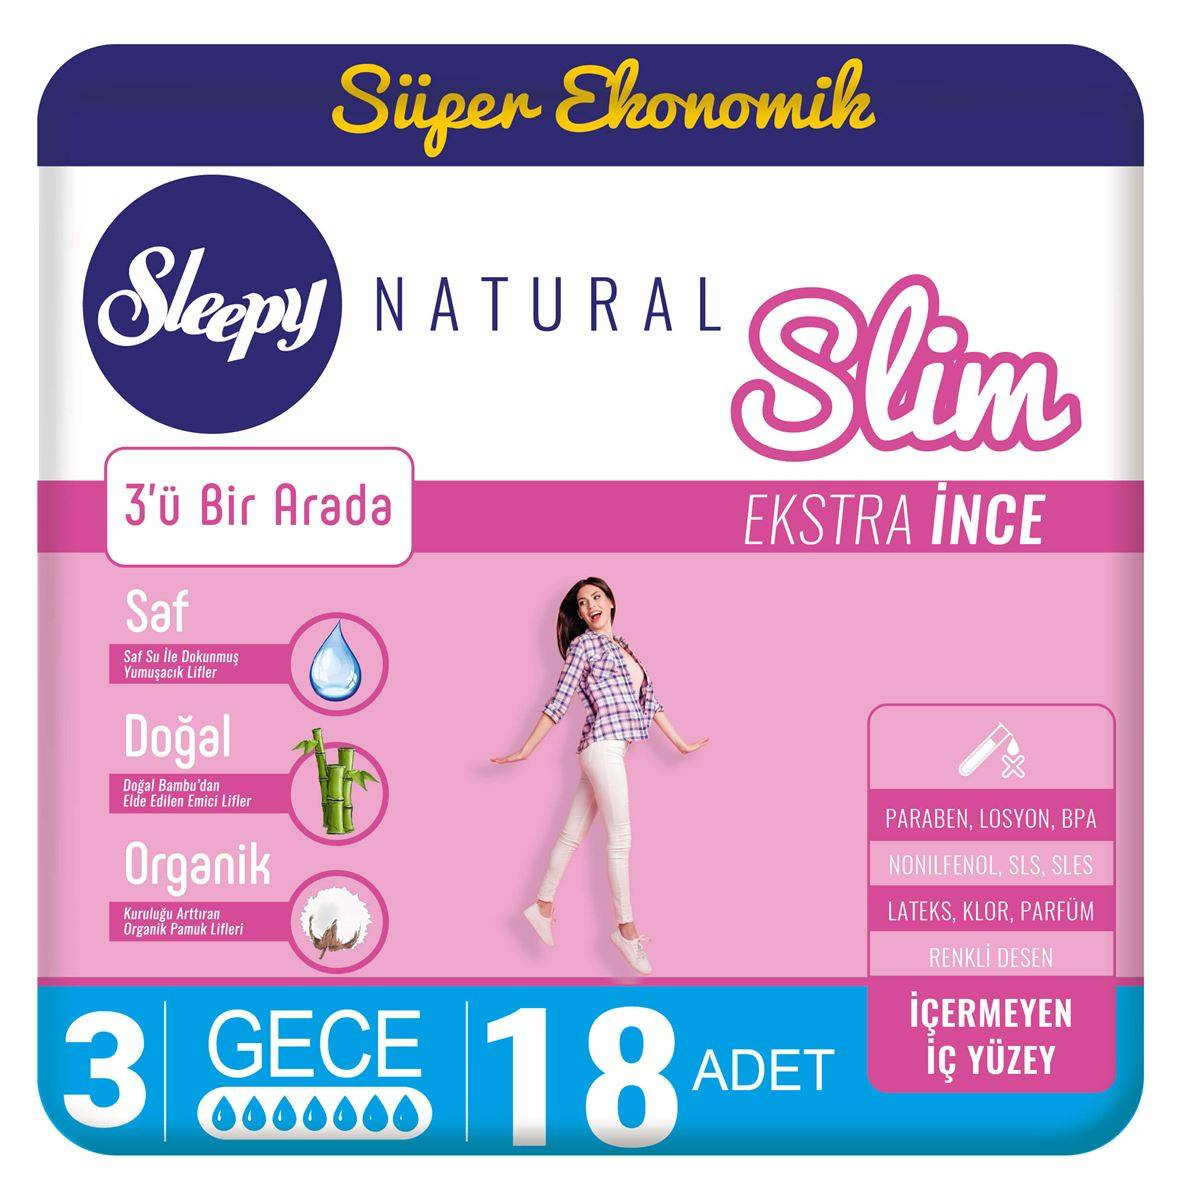 Sleepy Natural Slim Ekstra İnce Gece(18 Ped)